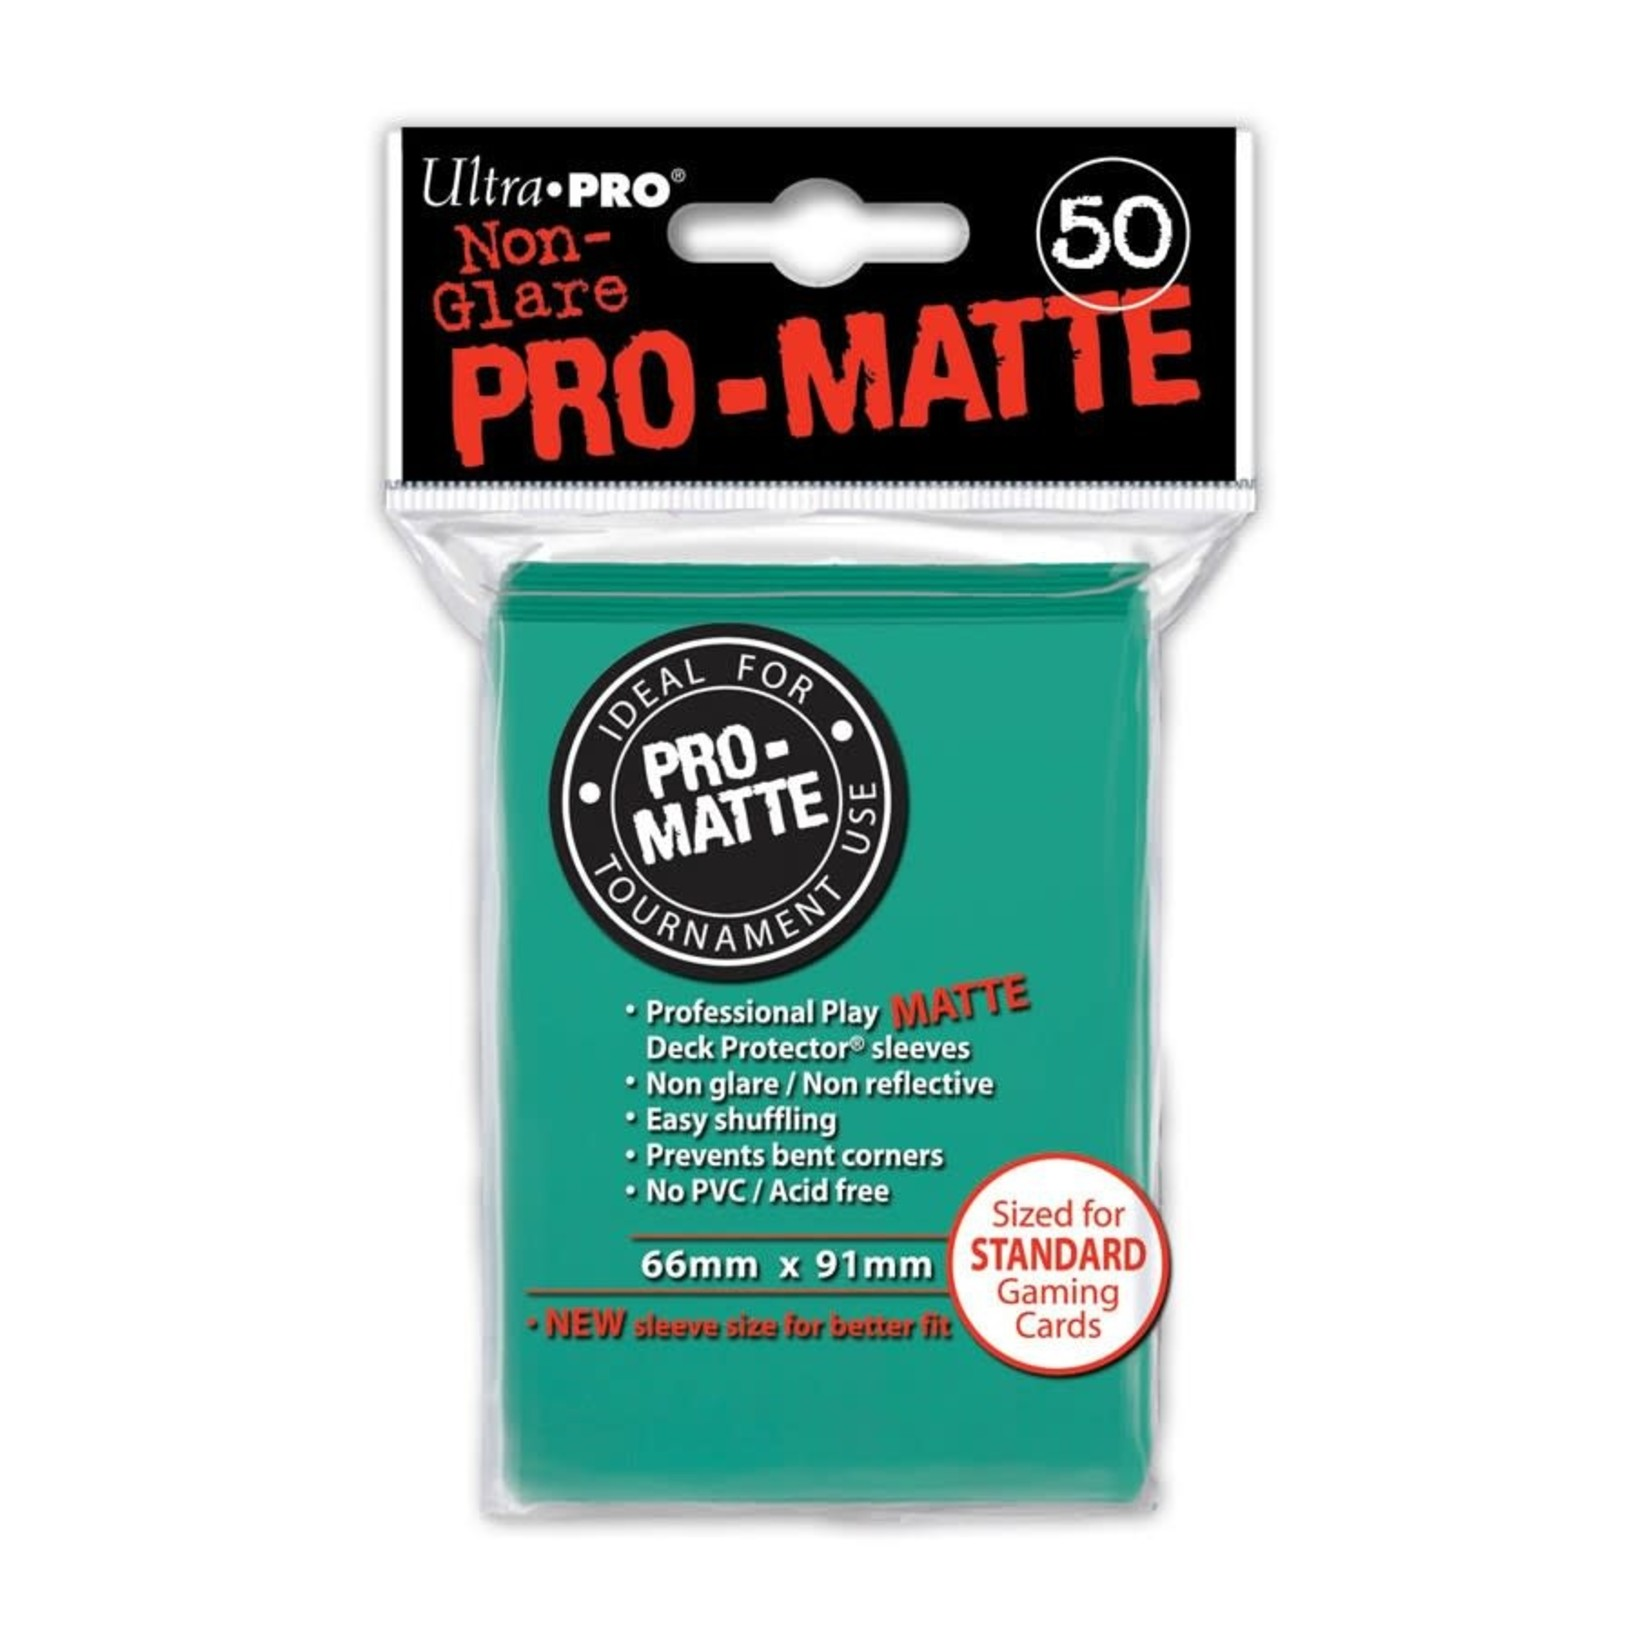 Ultra Pro Pro-Matte Aqua Card Sleeves (50)